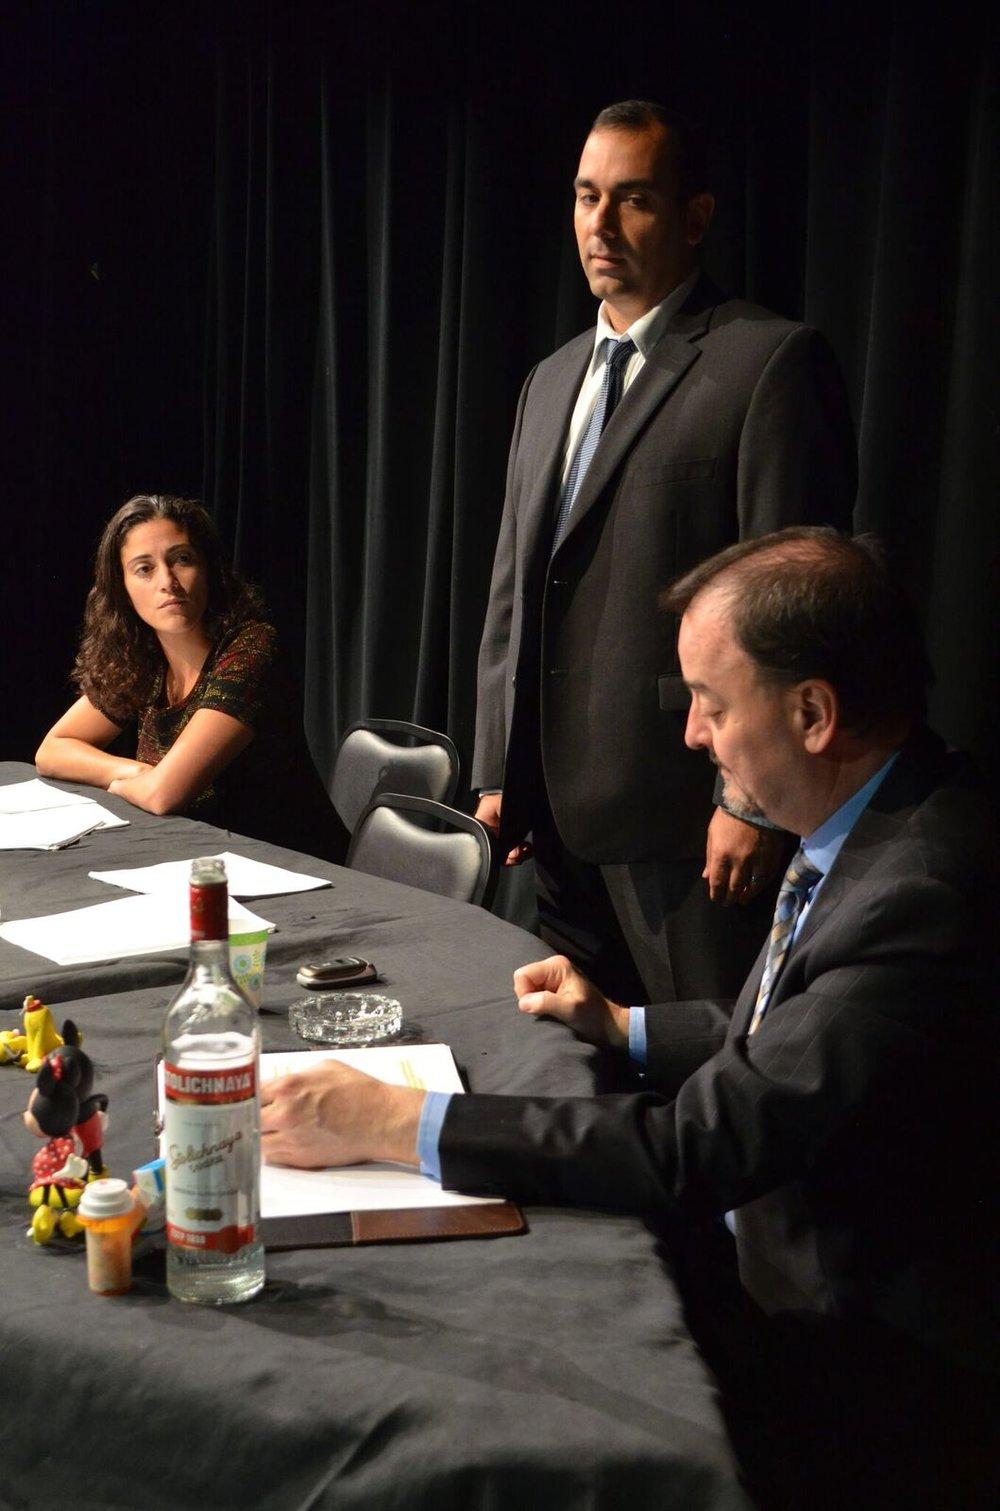 Melissa Smith, Steve Sc arpa and J. Kevin Smith